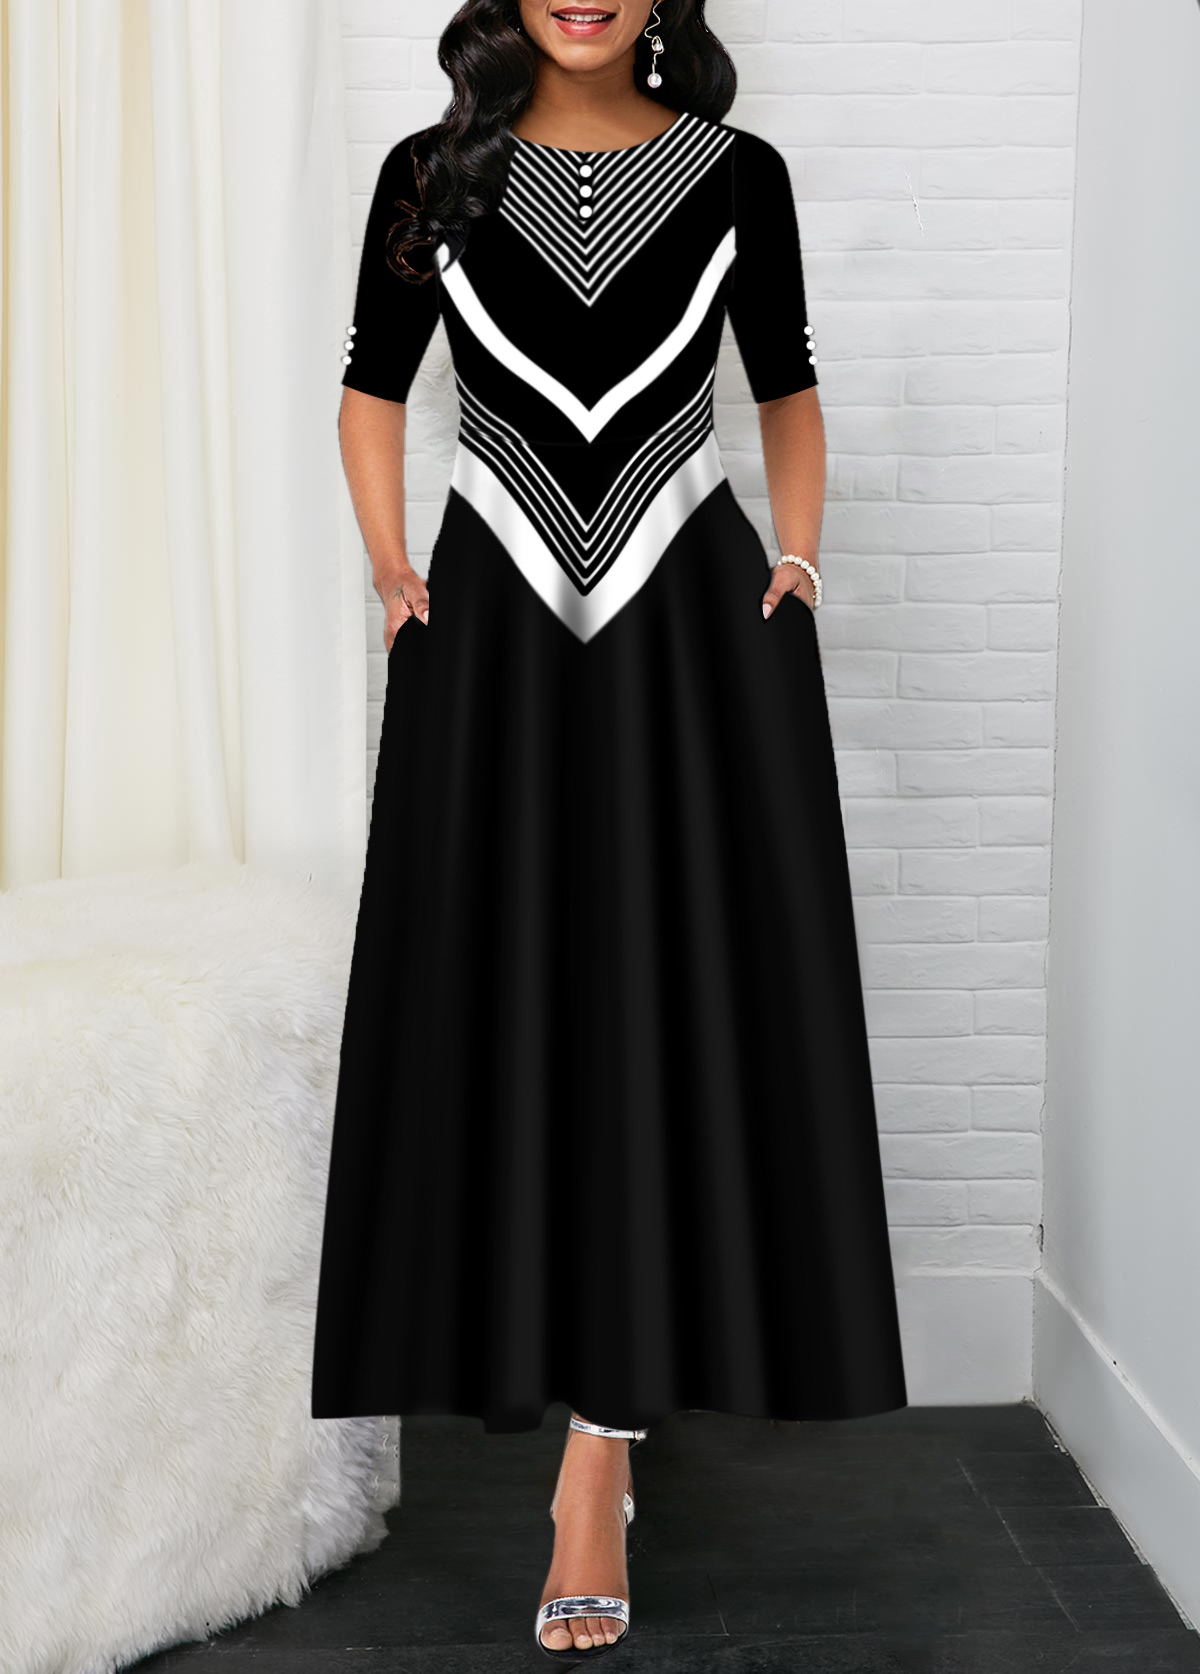 Chevron Print Black Back Zipper Maxi Dress